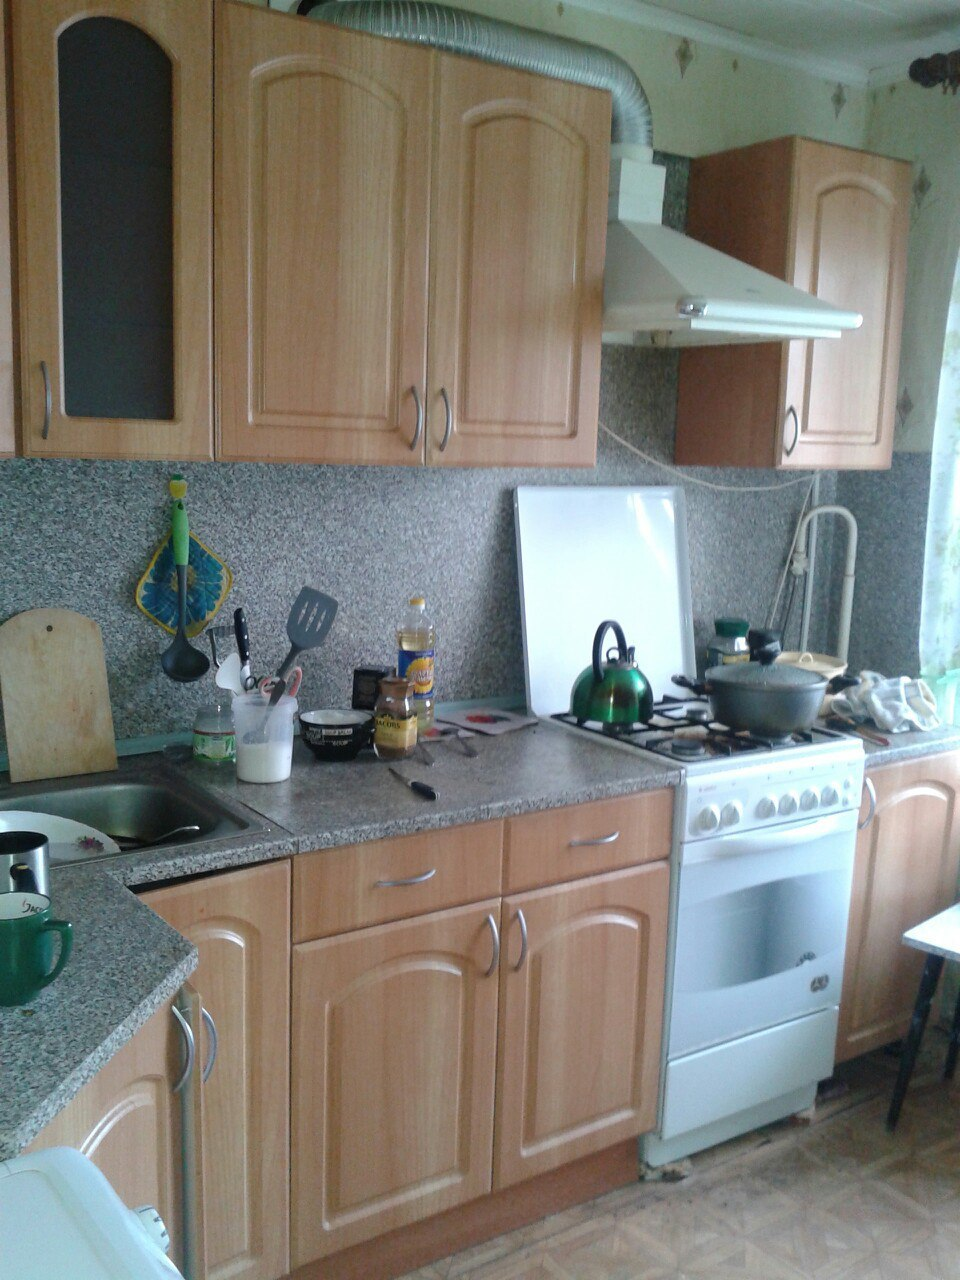 Продажа квартир: 1-комнатная квартира, Великий Новгород, ул. Юннатов, 7, фото 1